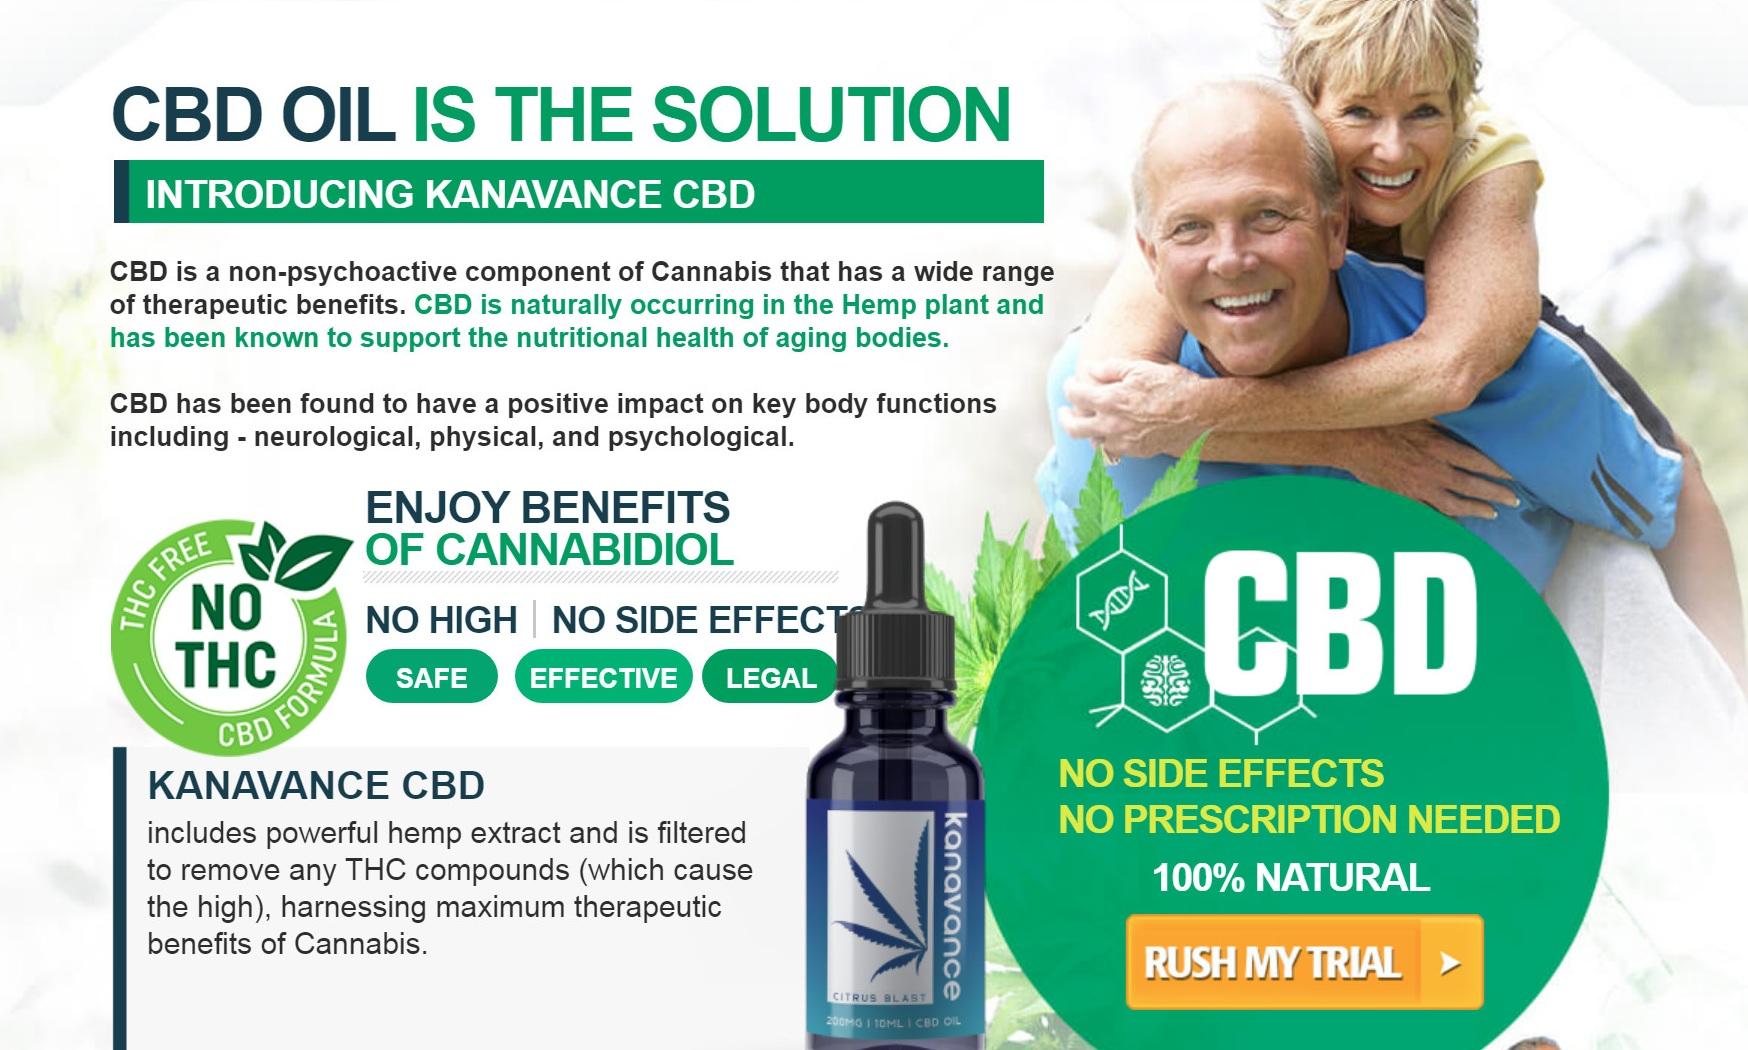 Kanavance CBD Oil Introduction